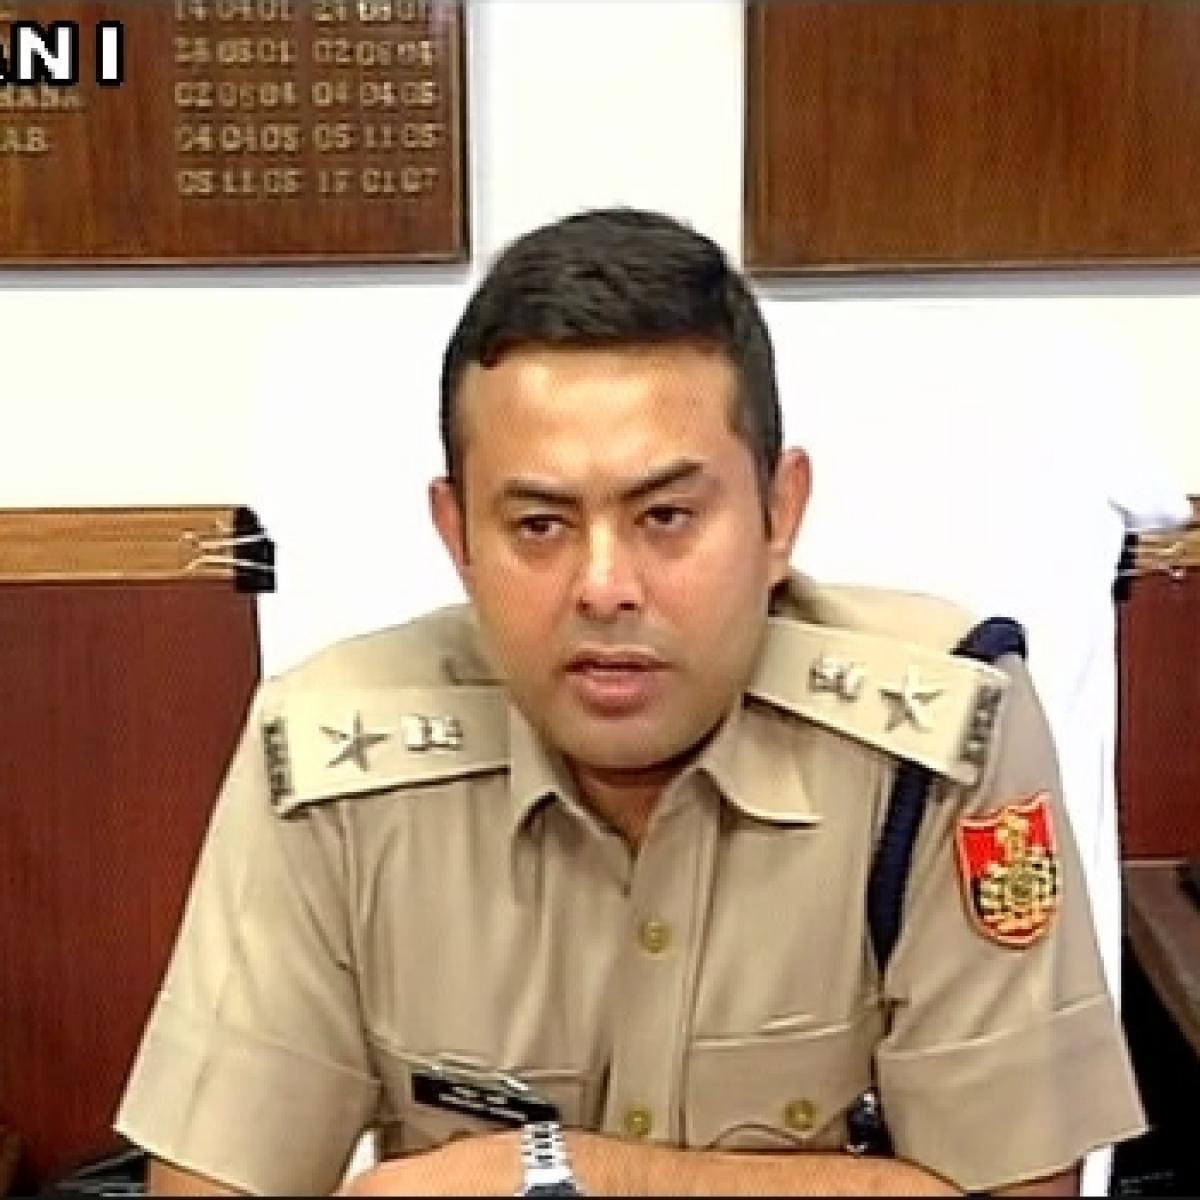 Delhi Police spokesperson Madhur Verma transferred to Arunachal Pradesh